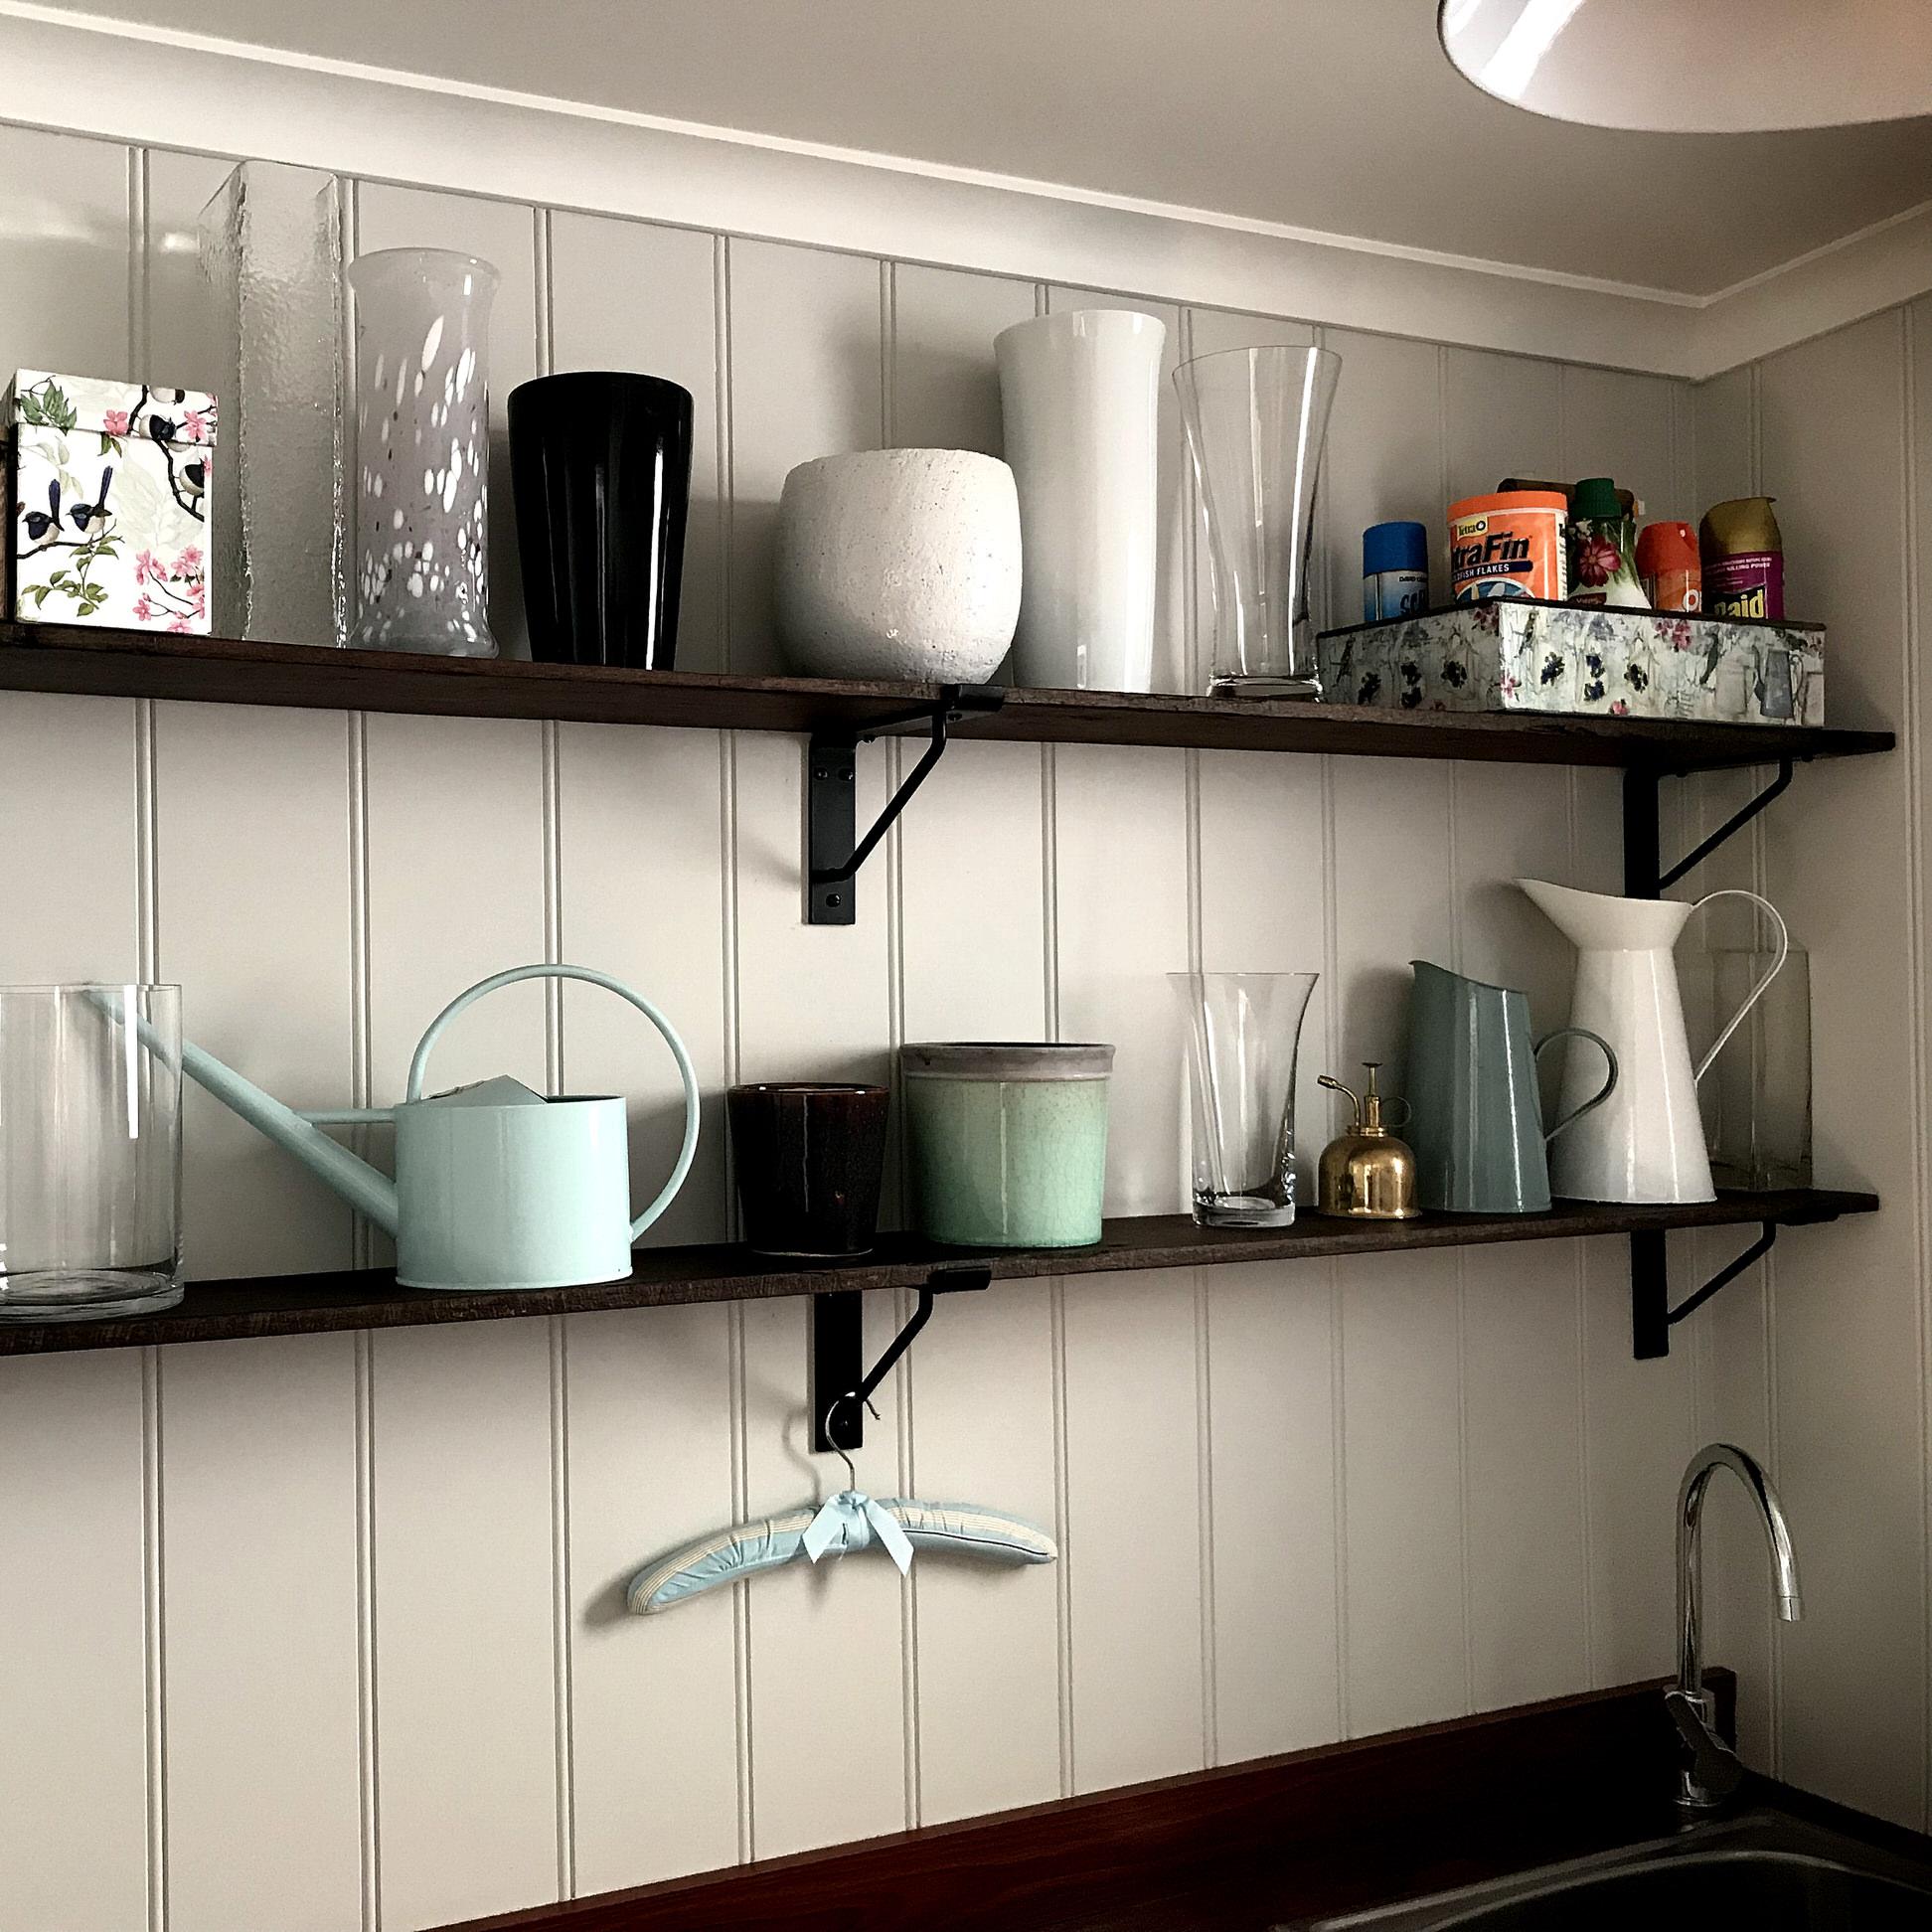 Custom No.5 Shelf Bracket In Laundry Room